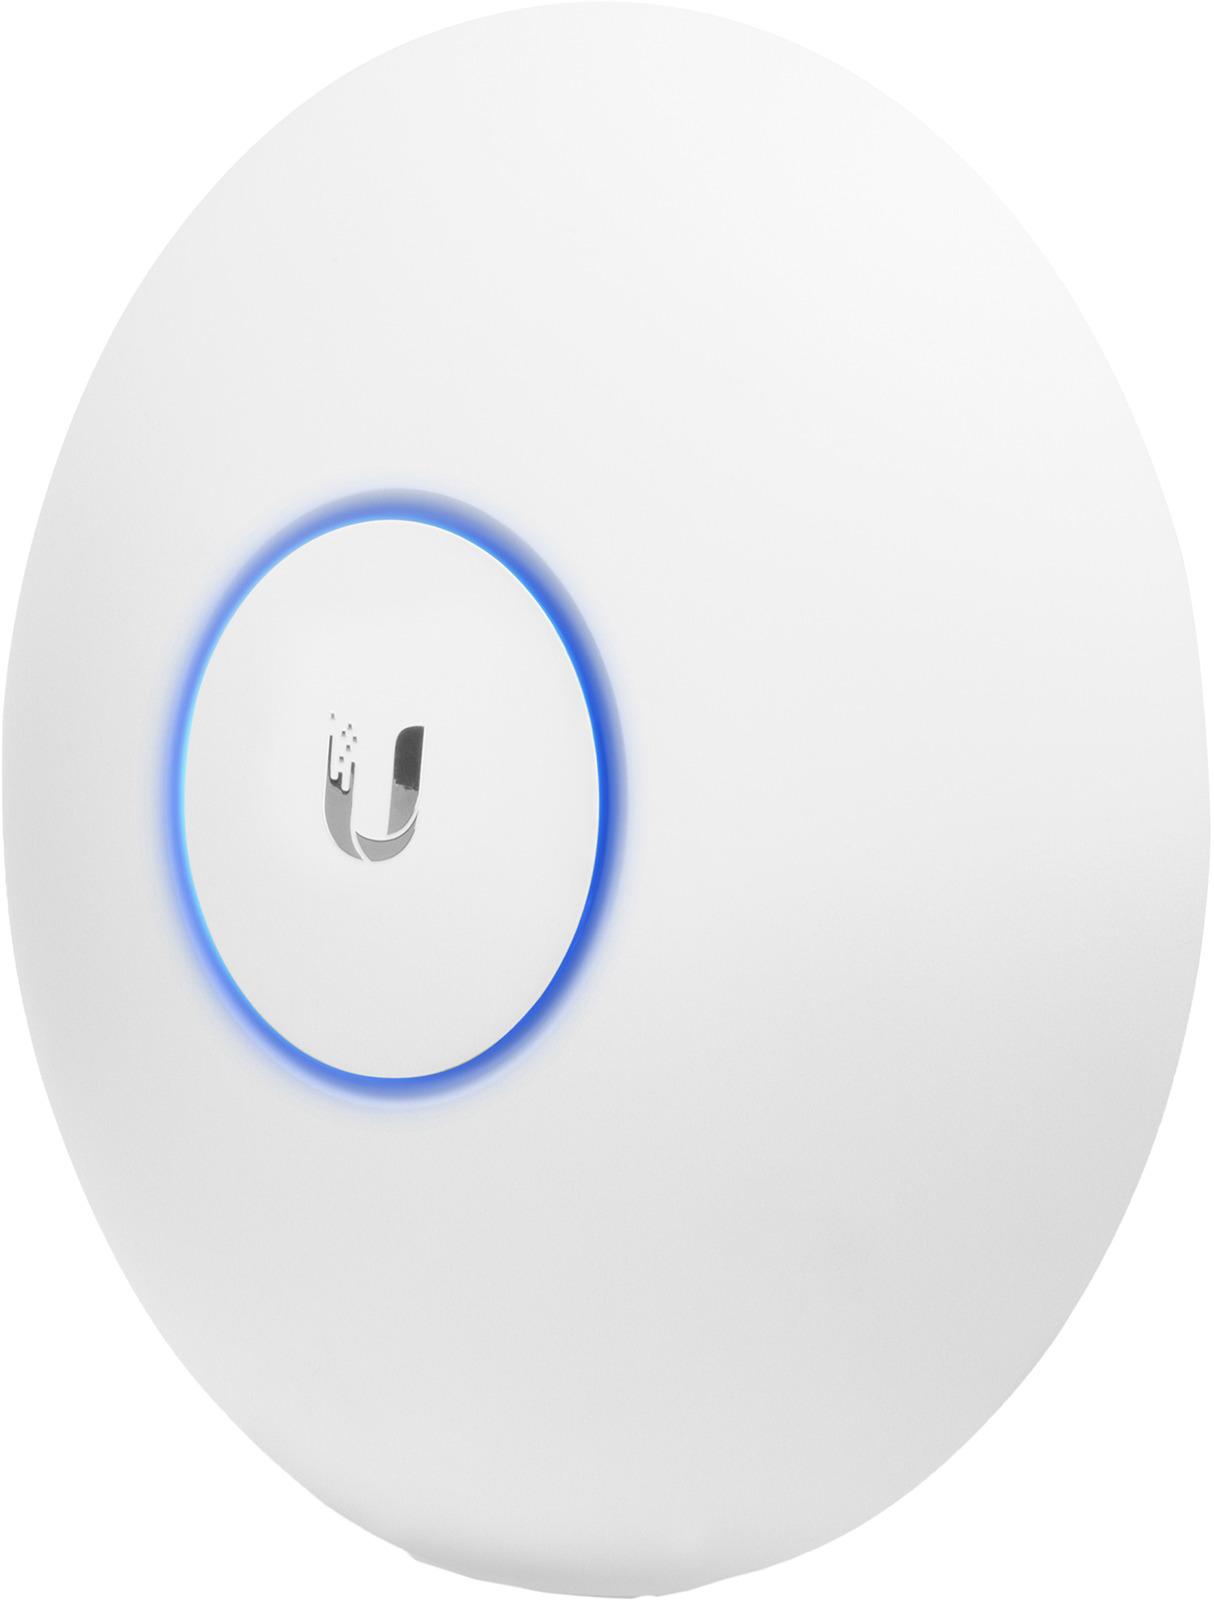 Точка доступа Ubiquiti, UAP-AC-LR(EU), белый